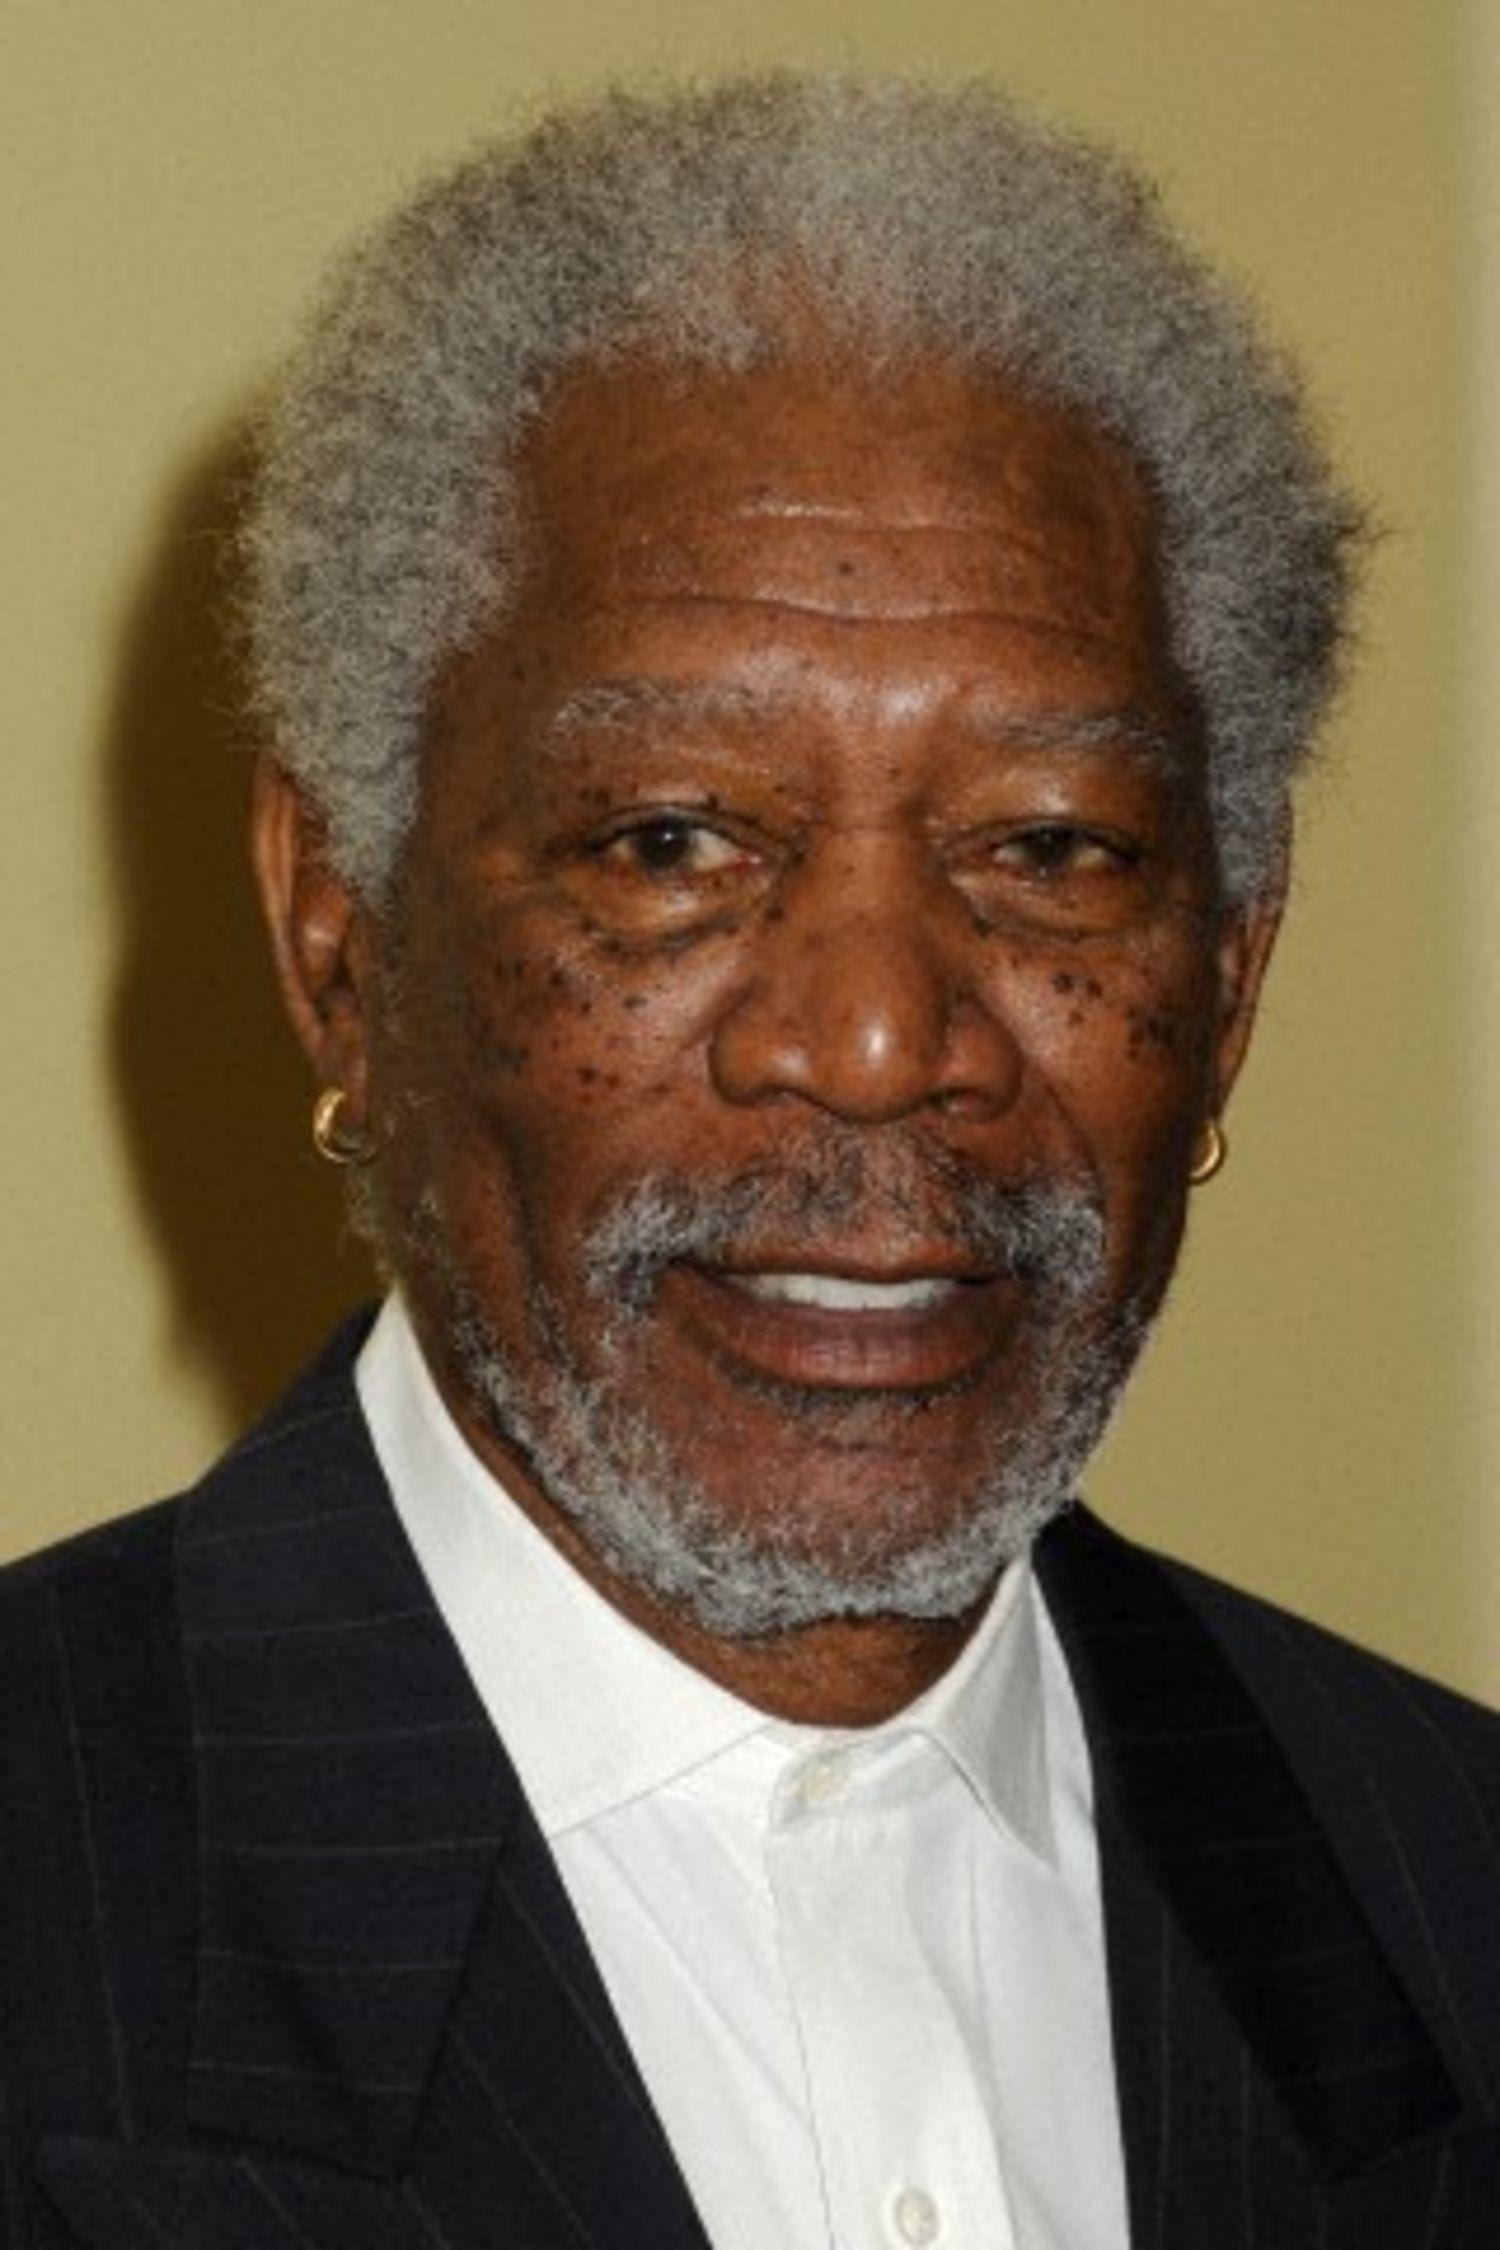 Morgan Freeman For mobile